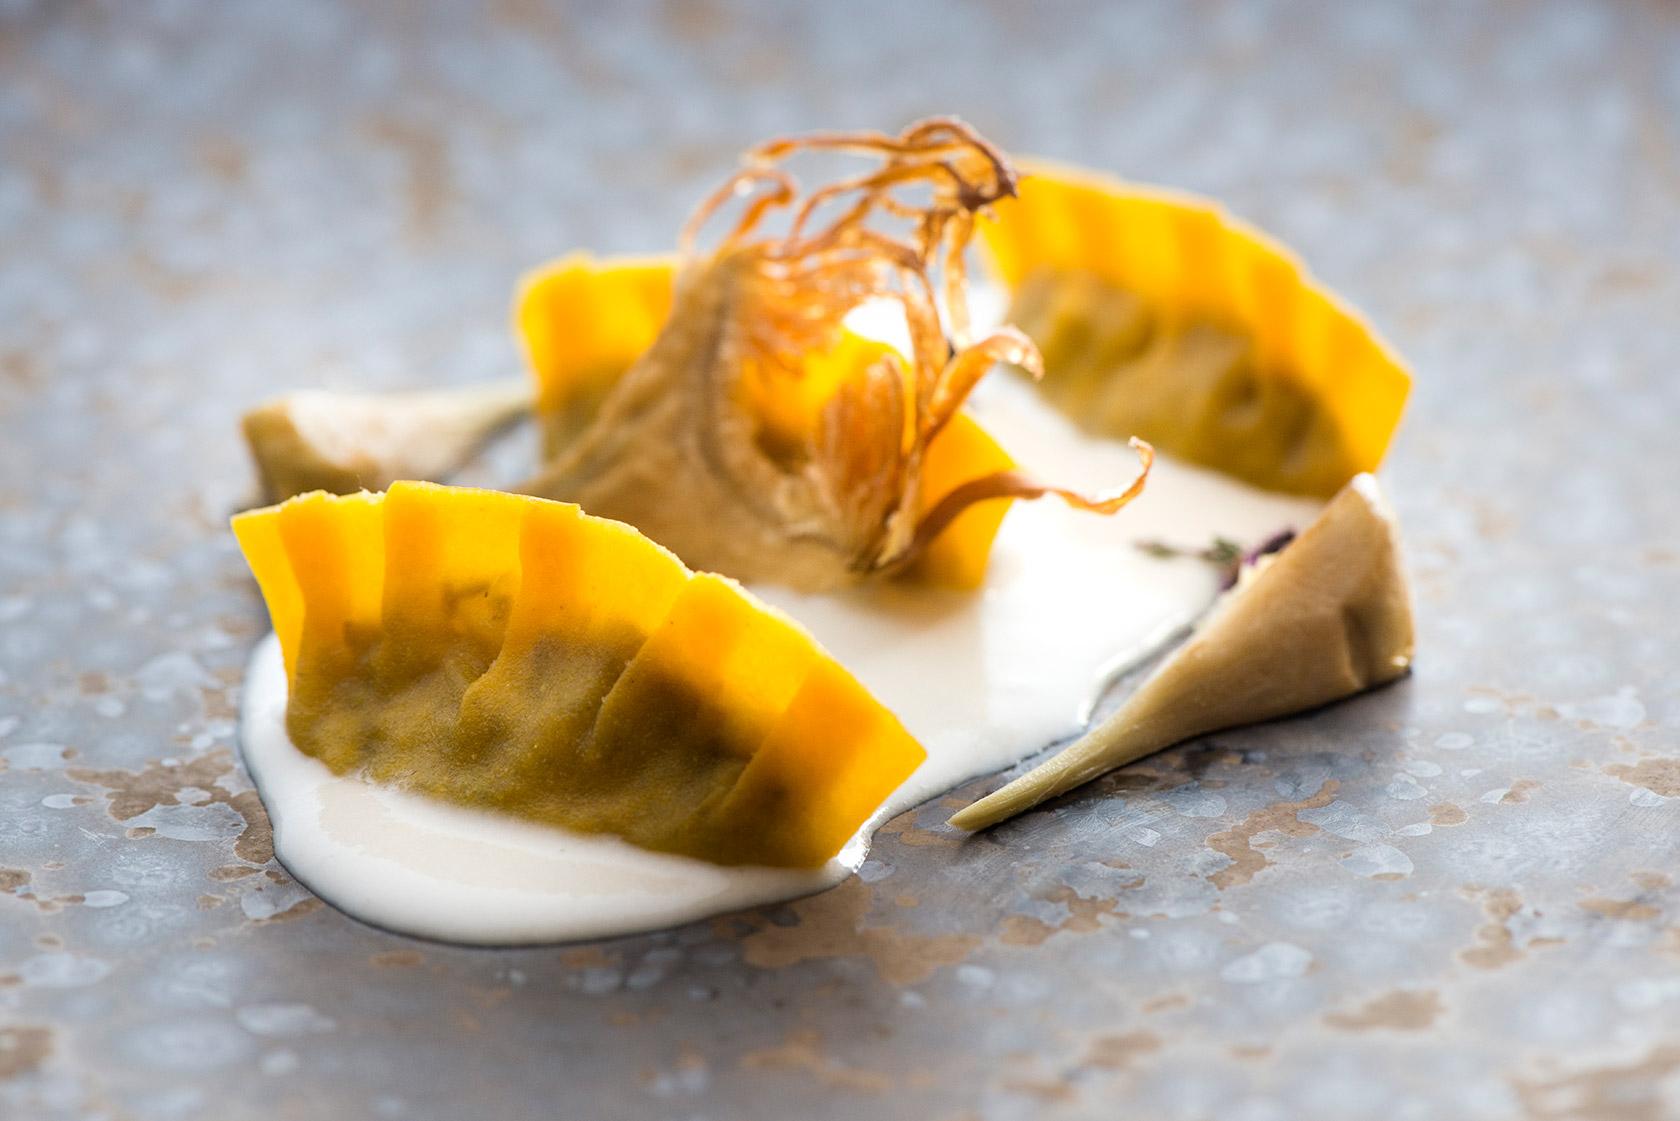 arnolfo-ristornate-tortelli-carciofi-gaetano-trovato-chef